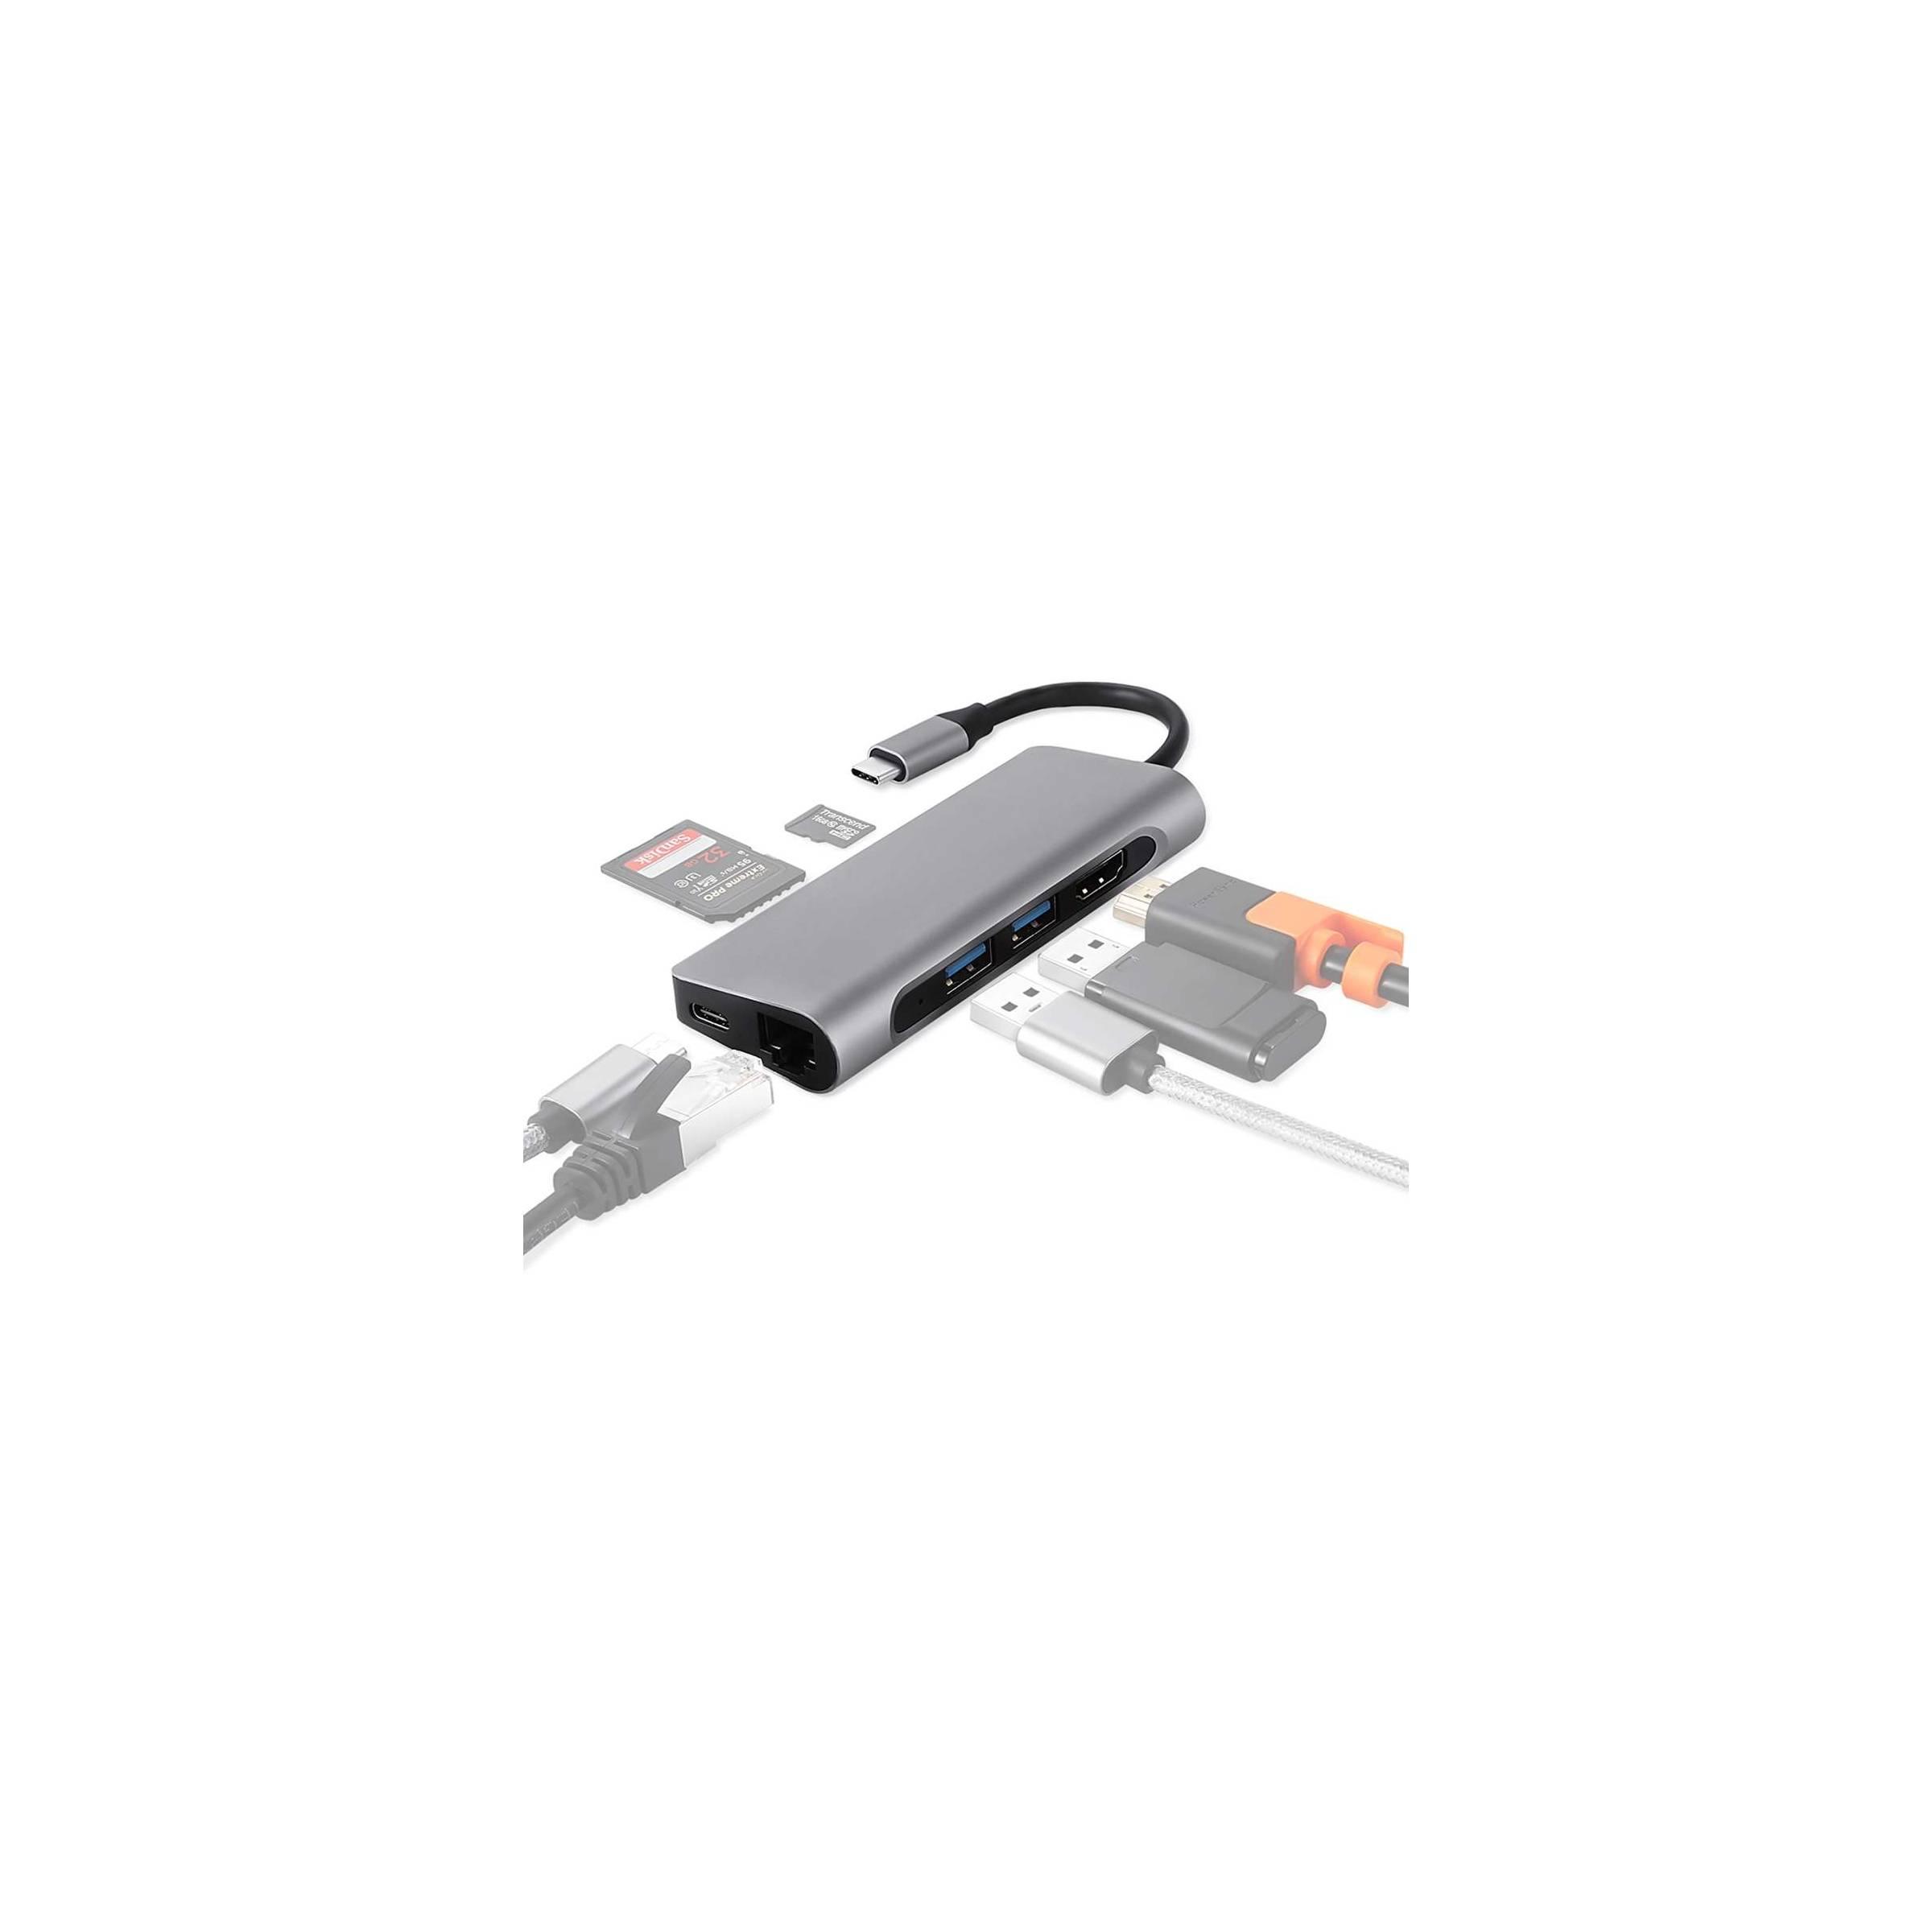 Usb-c dock med hdmi, rj-45, 2x usb 3.0, micro sd og sd kort fra kina oem på mackabler.dk